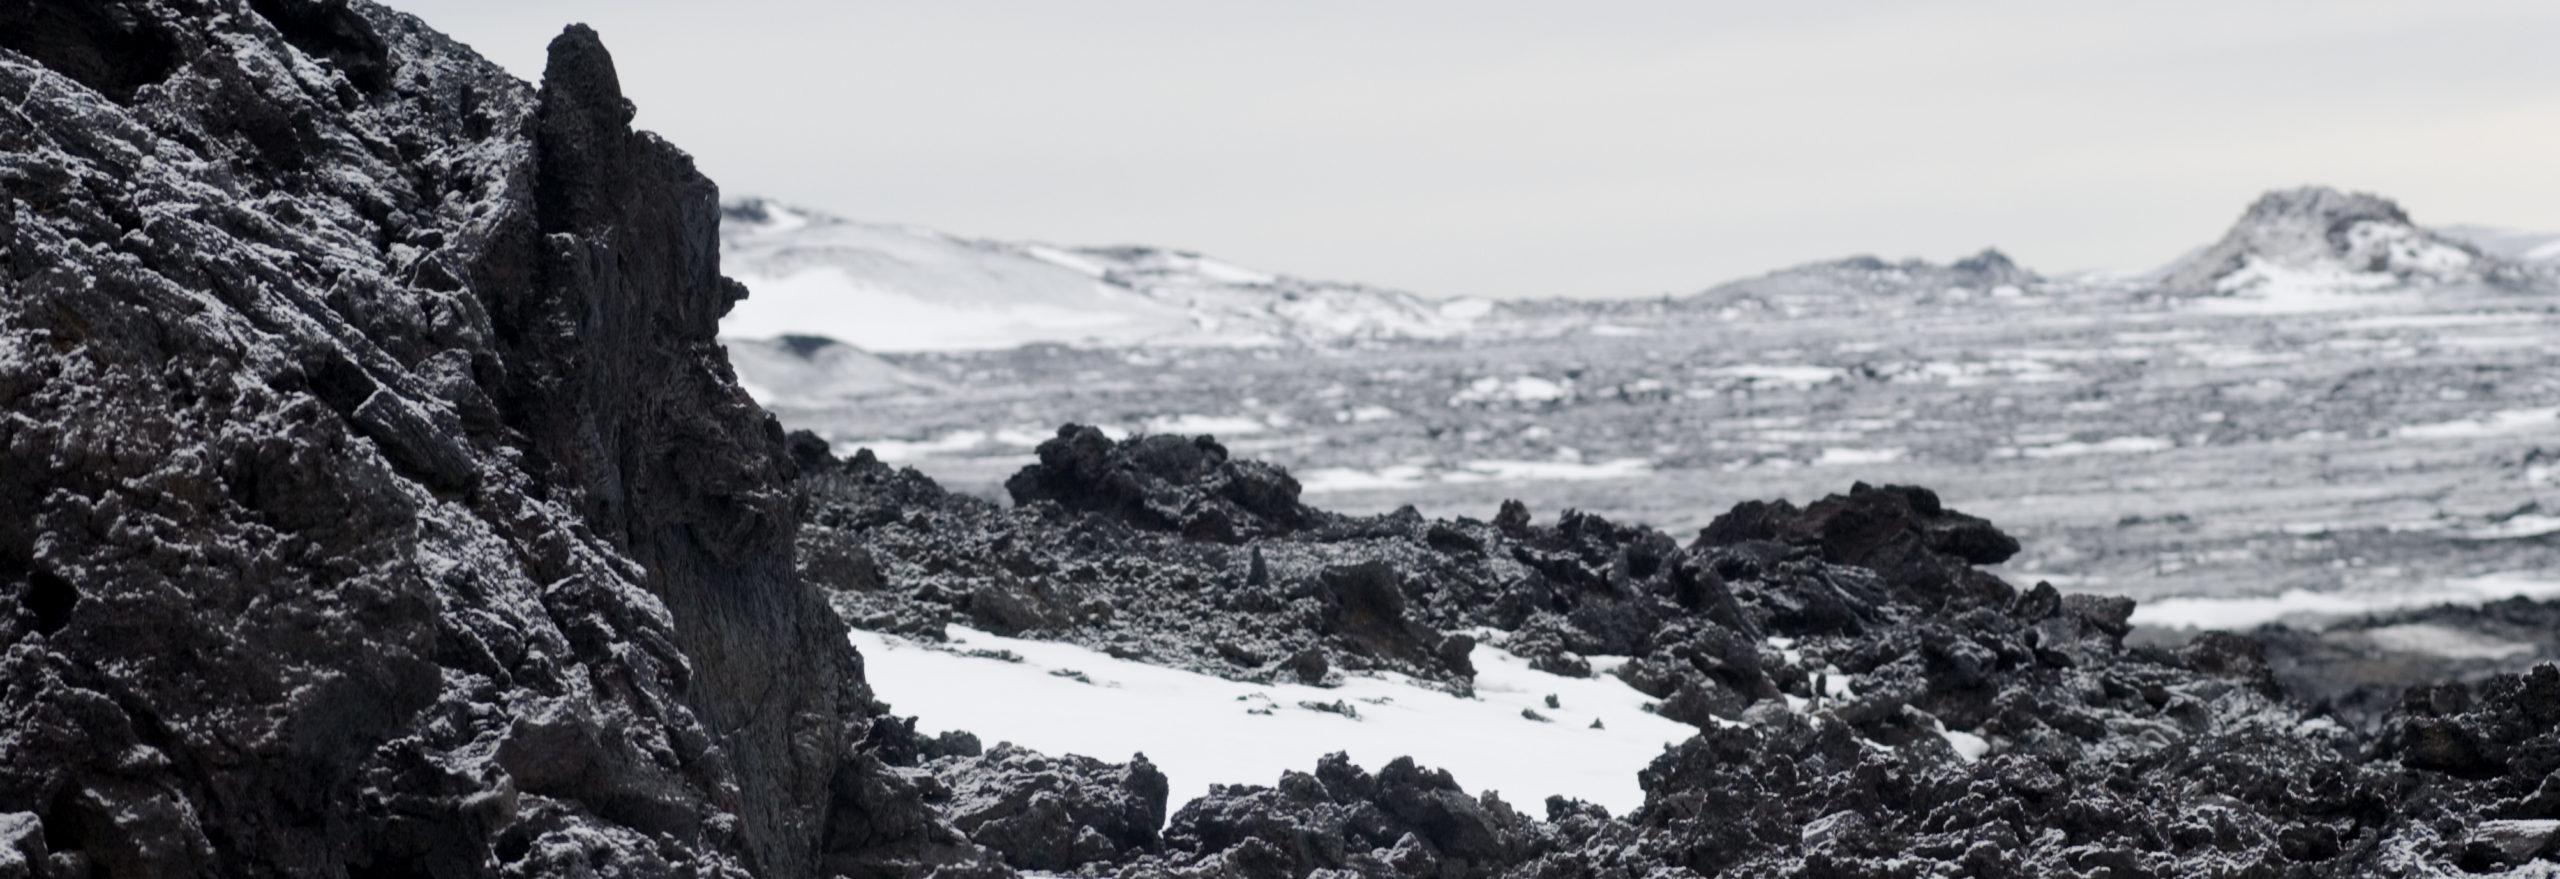 Philadelphia photographer to exhibit Iceland  Landscapes, Delaware River Images at MCCC Exhibit